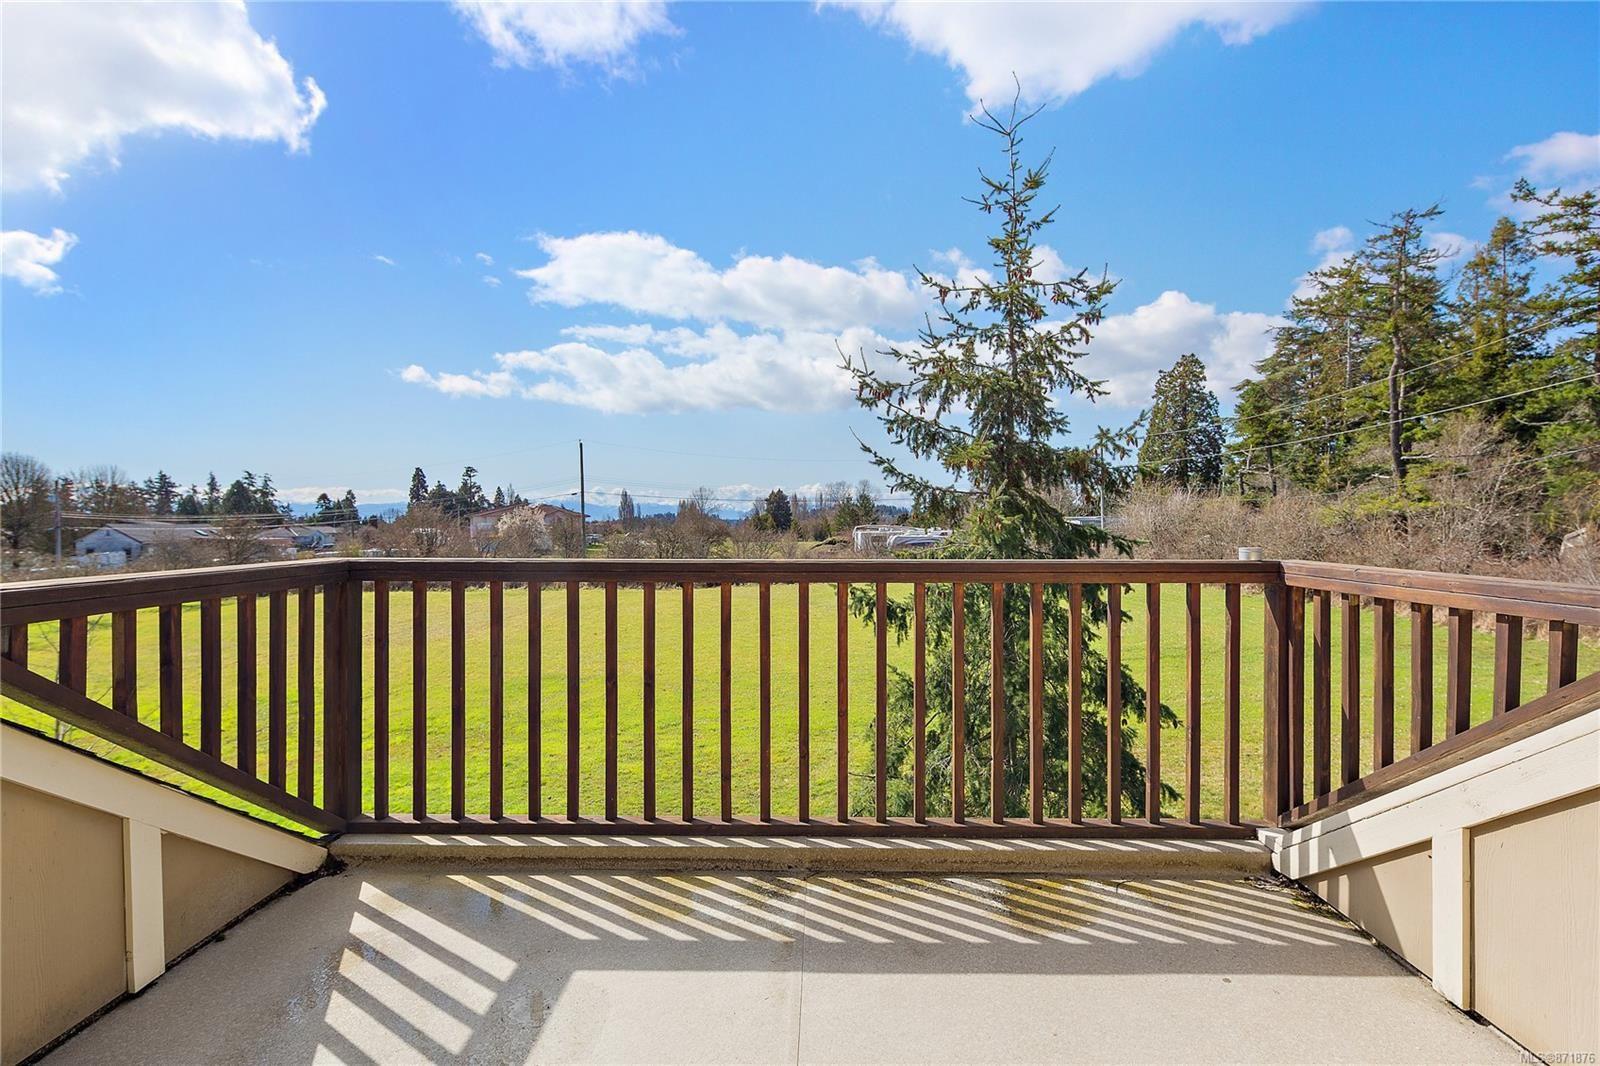 Photo 44: Photos: 4420 Wilkinson Rd in : SW Royal Oak House for sale (Saanich West)  : MLS®# 871876